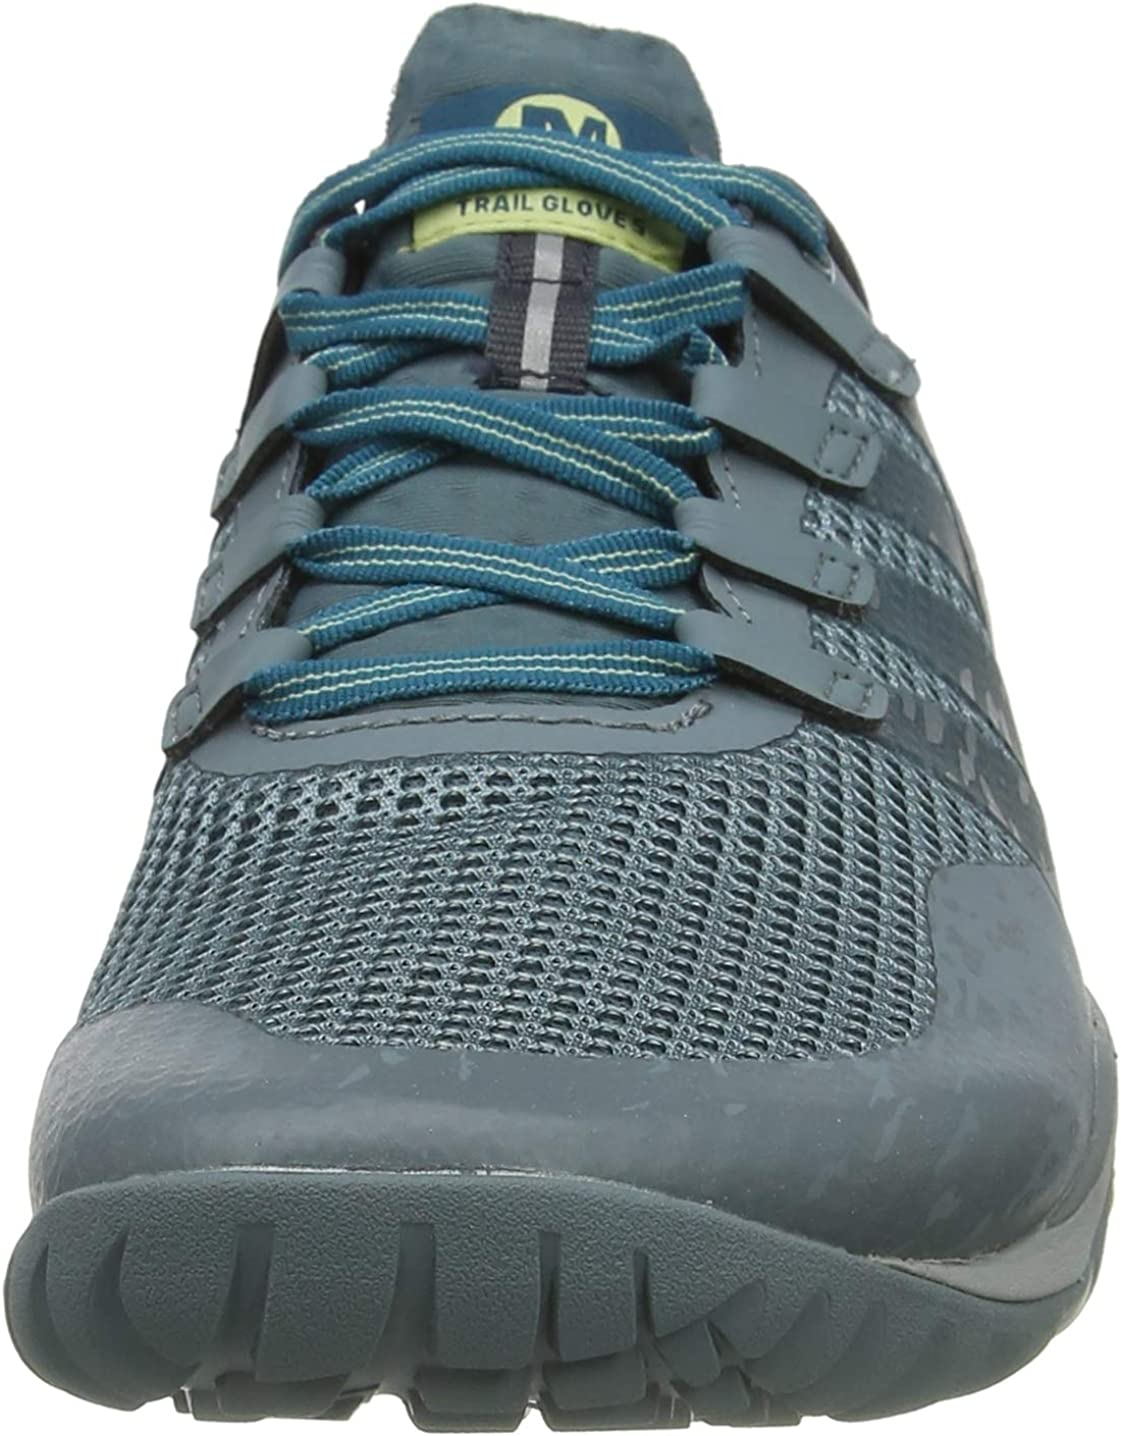 Merrell Trail Glove 5, Chaussures De Fitness Homme Vert Trooper